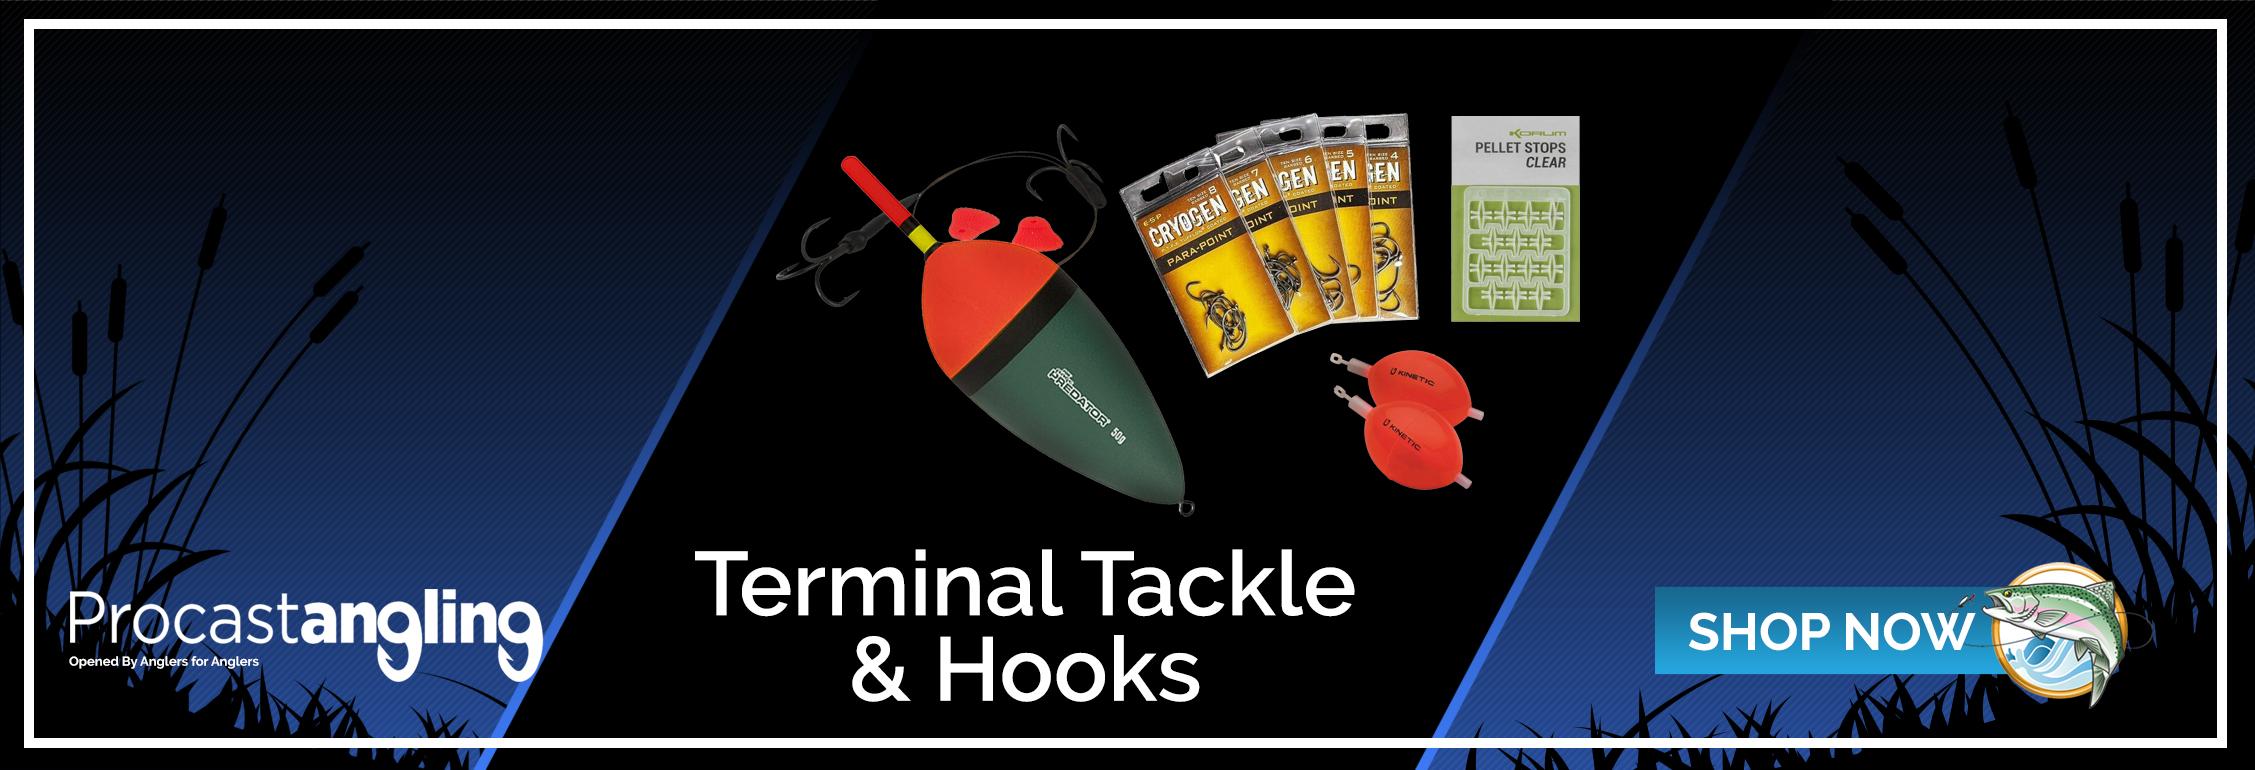 TERMINAL TACKLE & HOOKS